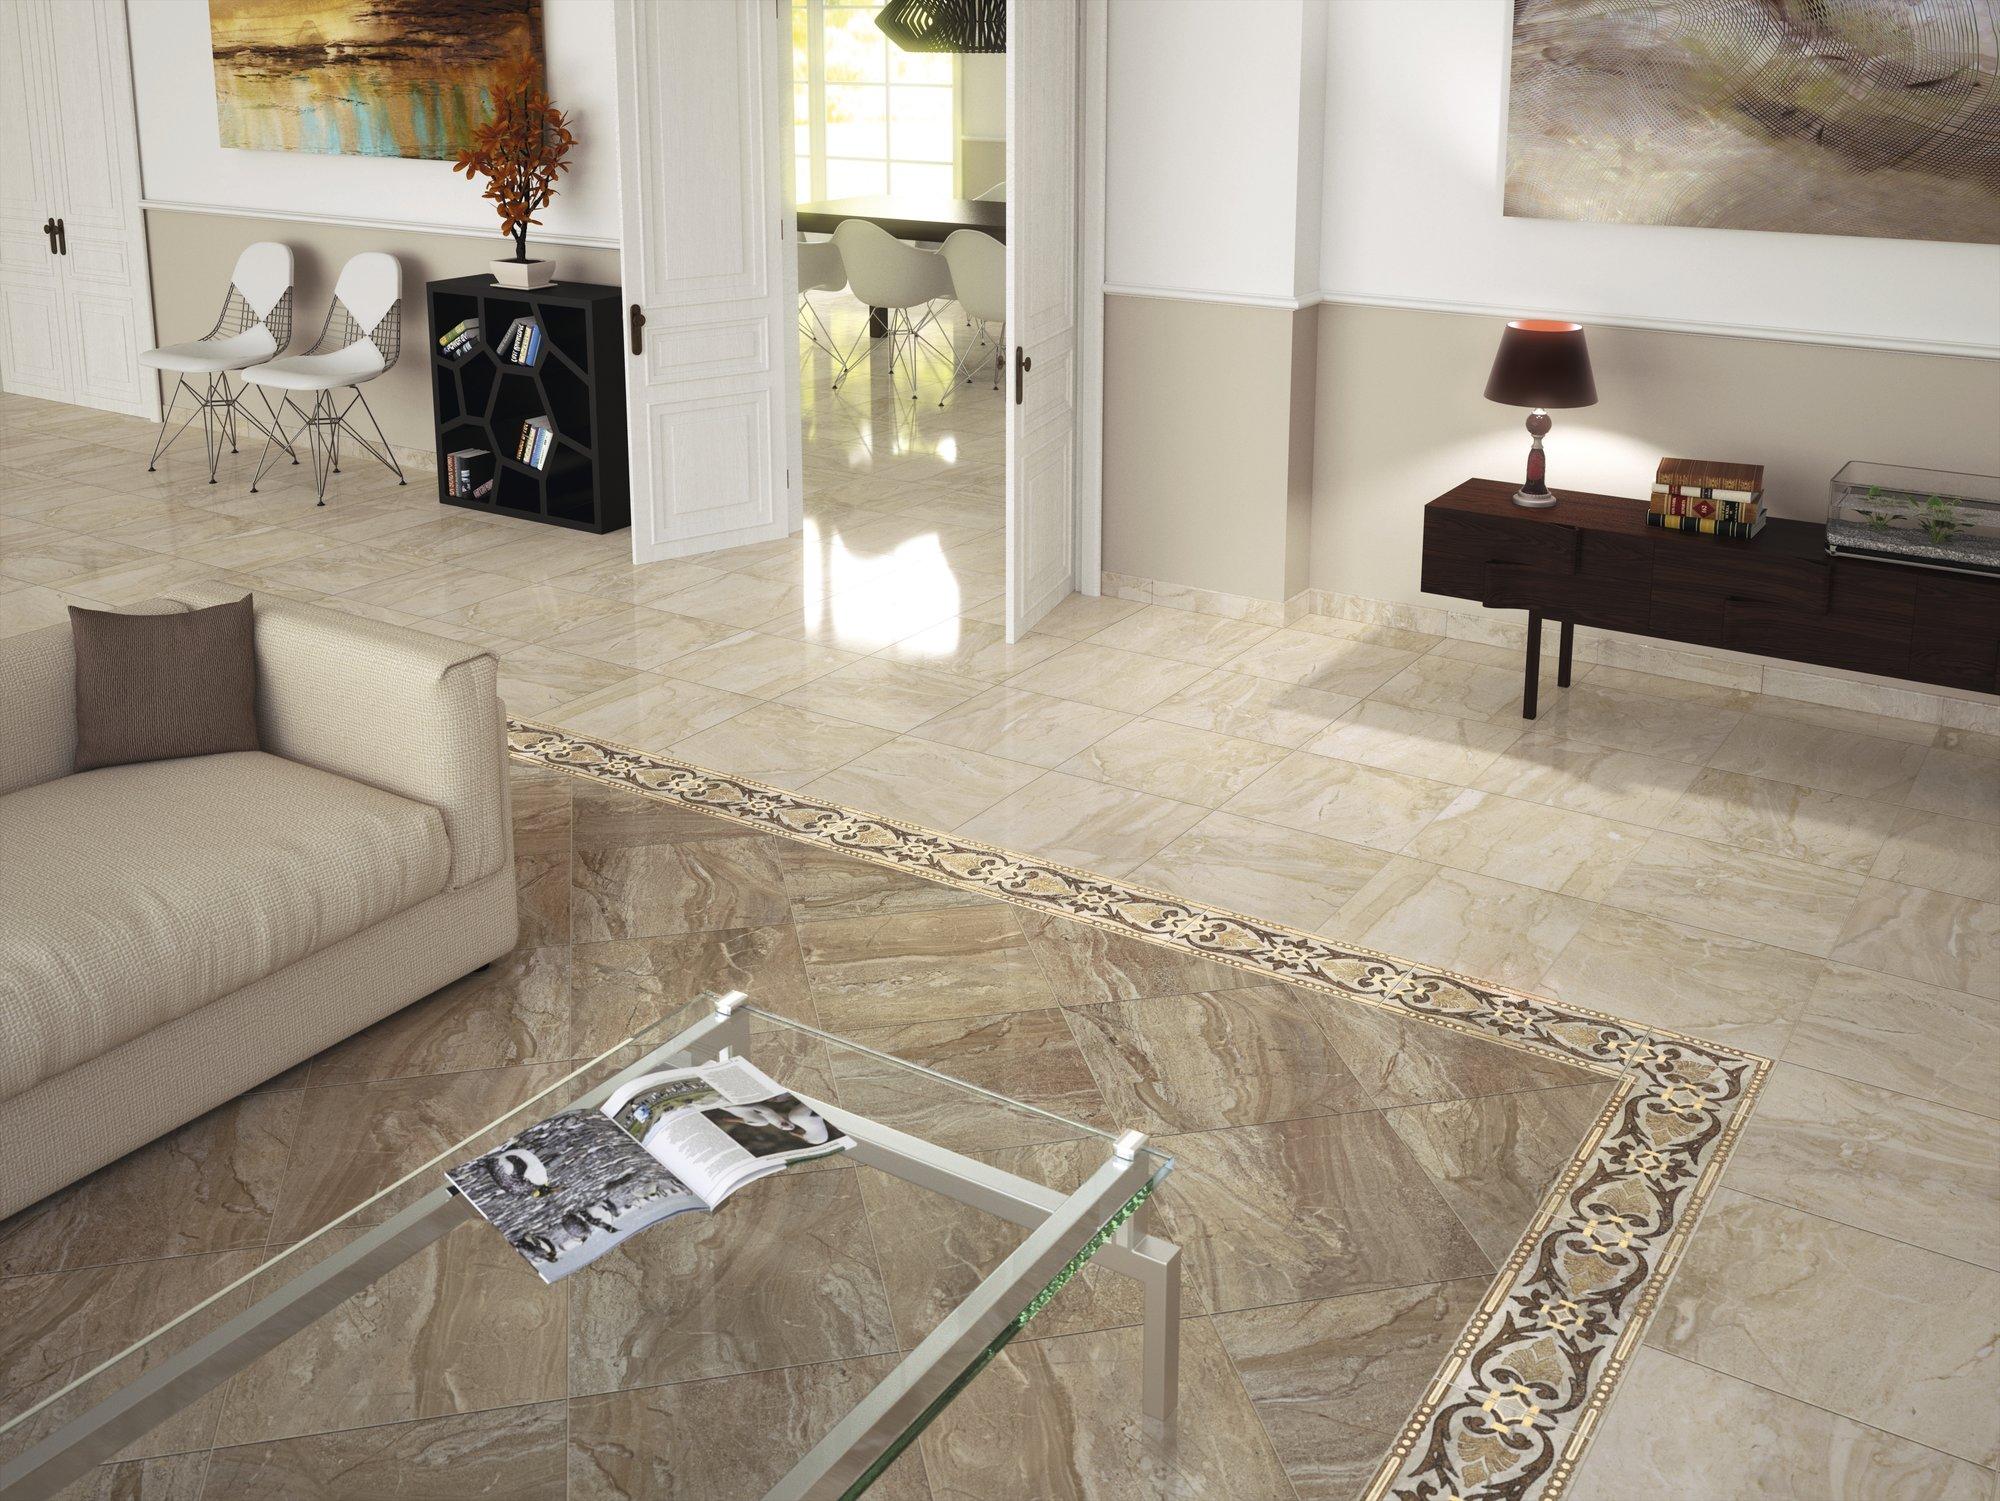 series Luxusní mramorová dlažba APE Jordan